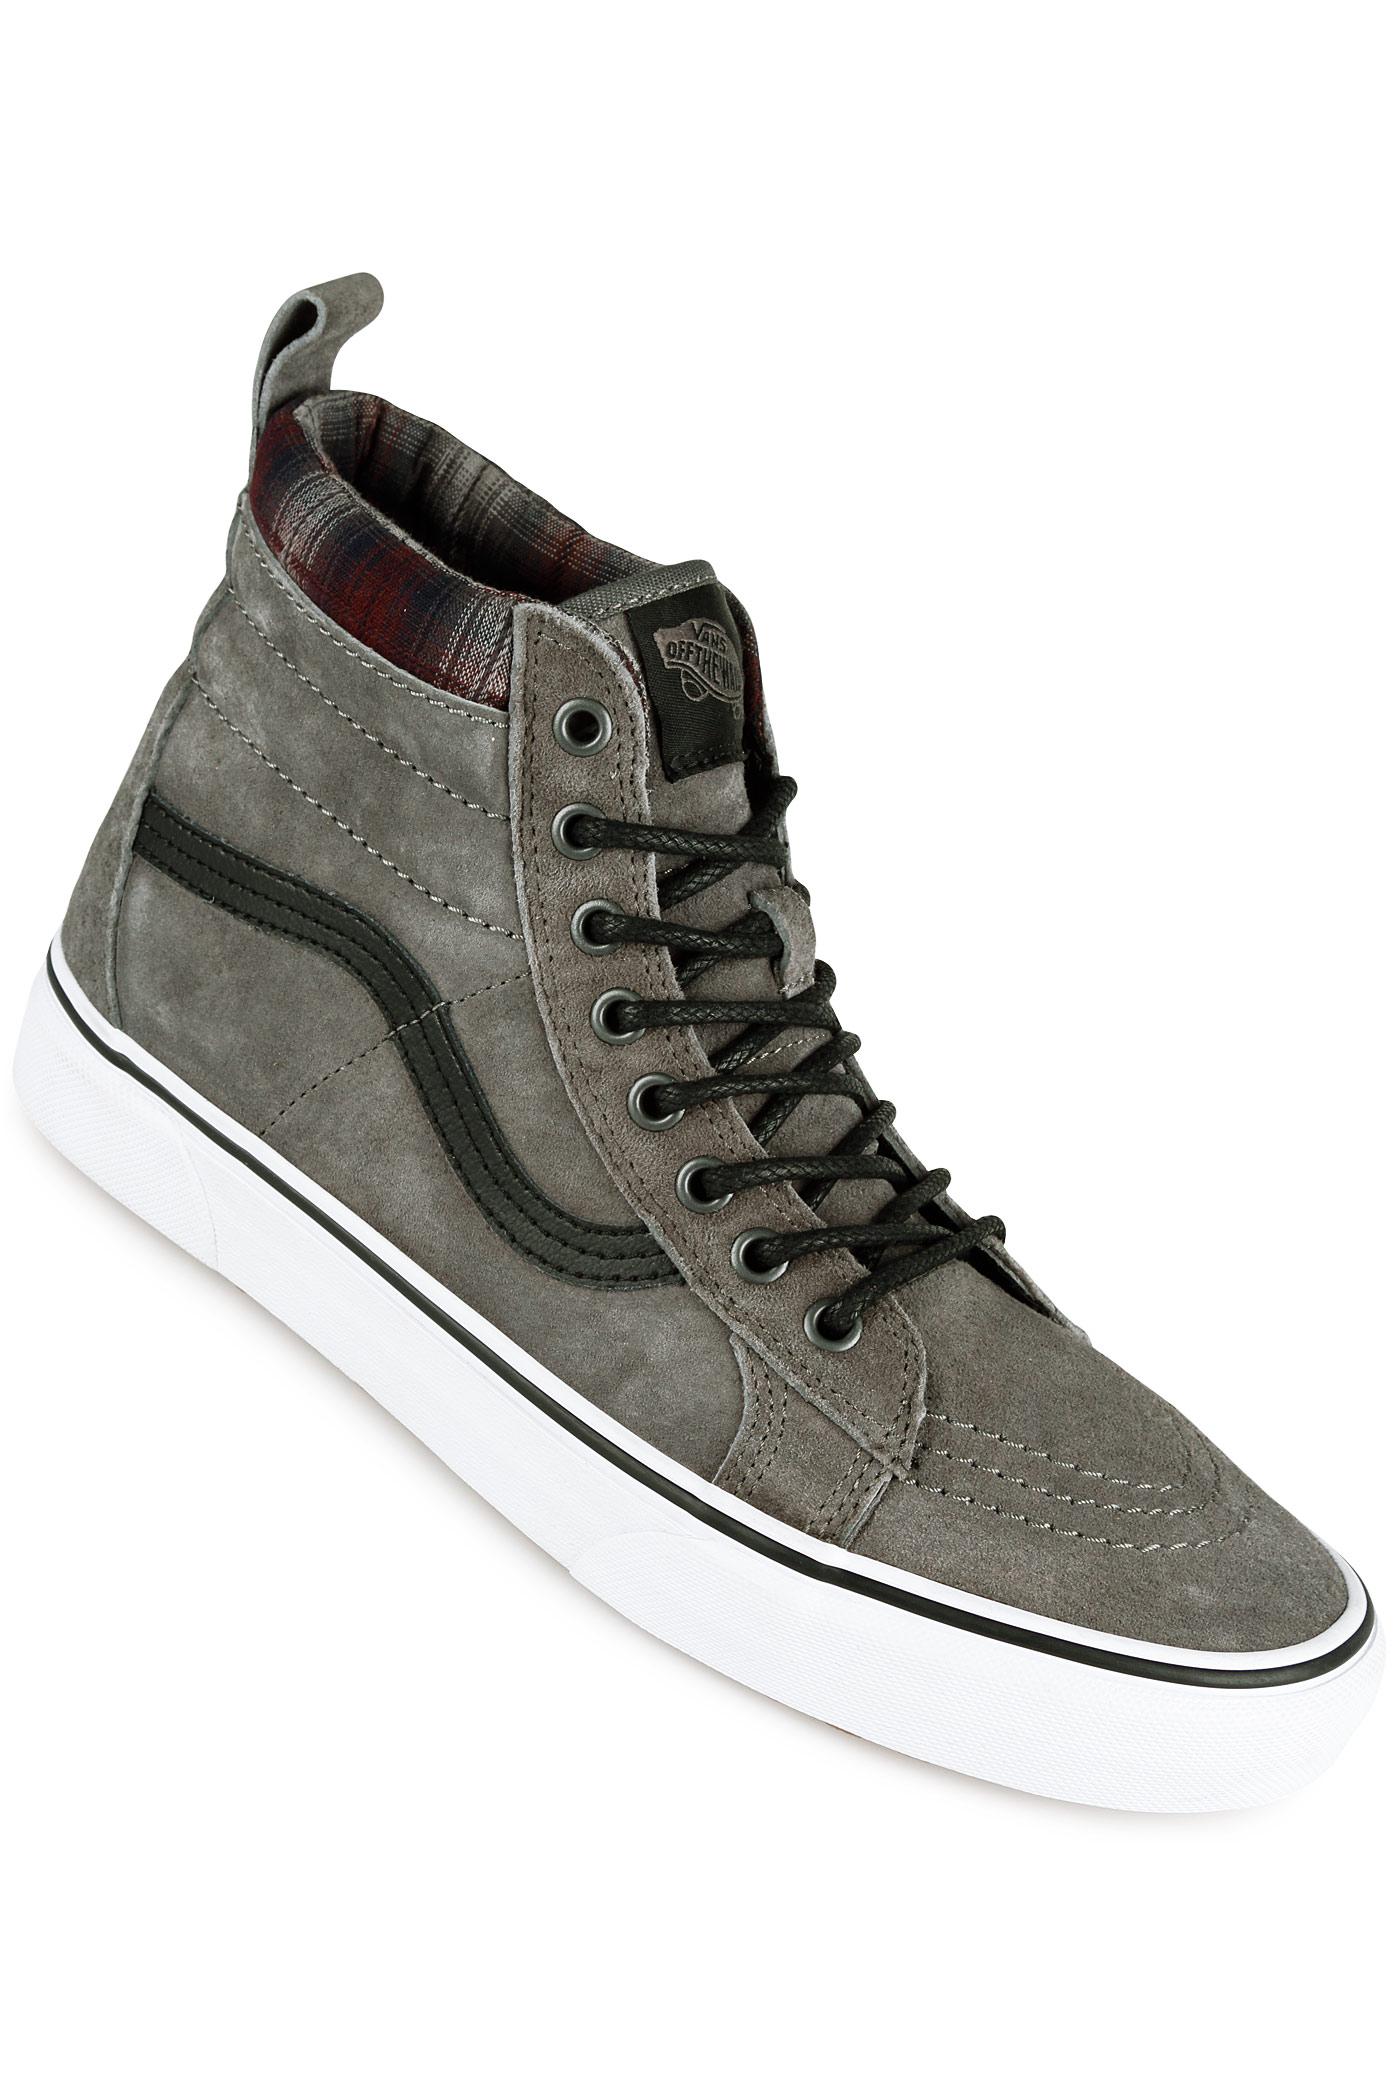 ad3a245c518 Vans Sk8-Hi MTE Shoe (pewter plaid) buy at skatedeluxe